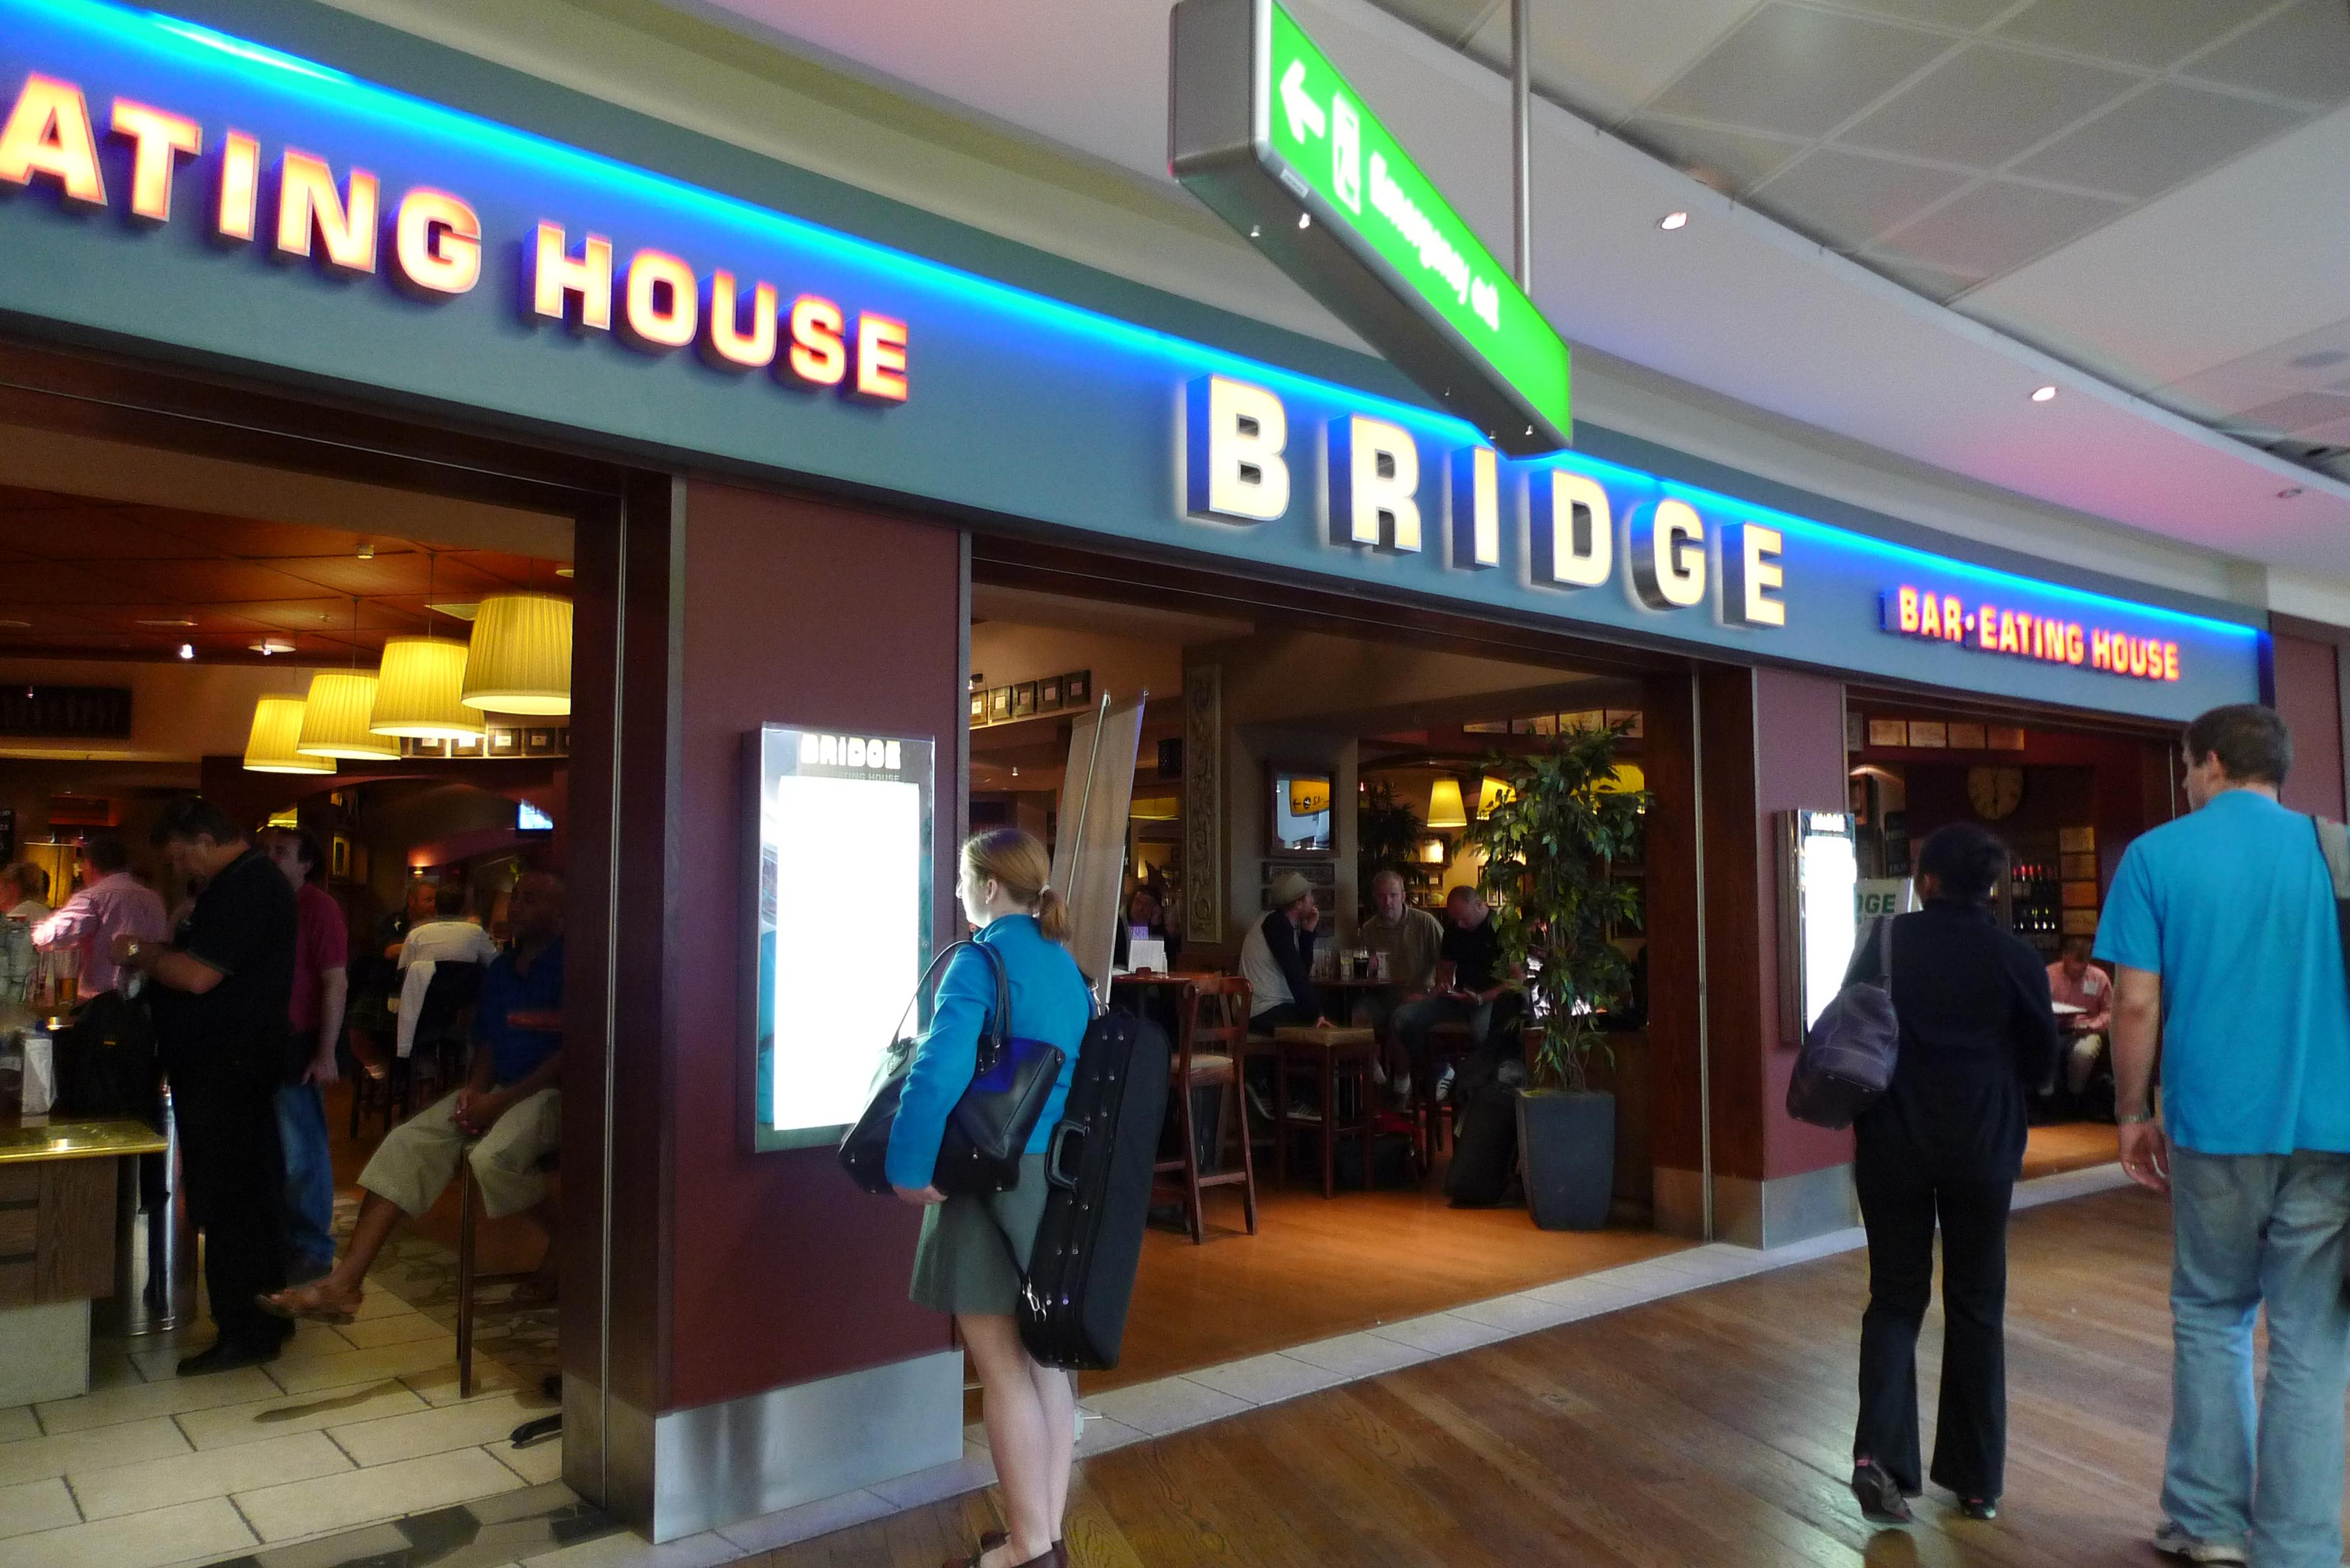 Bridge House Bar Dining Room Bermondsey Se